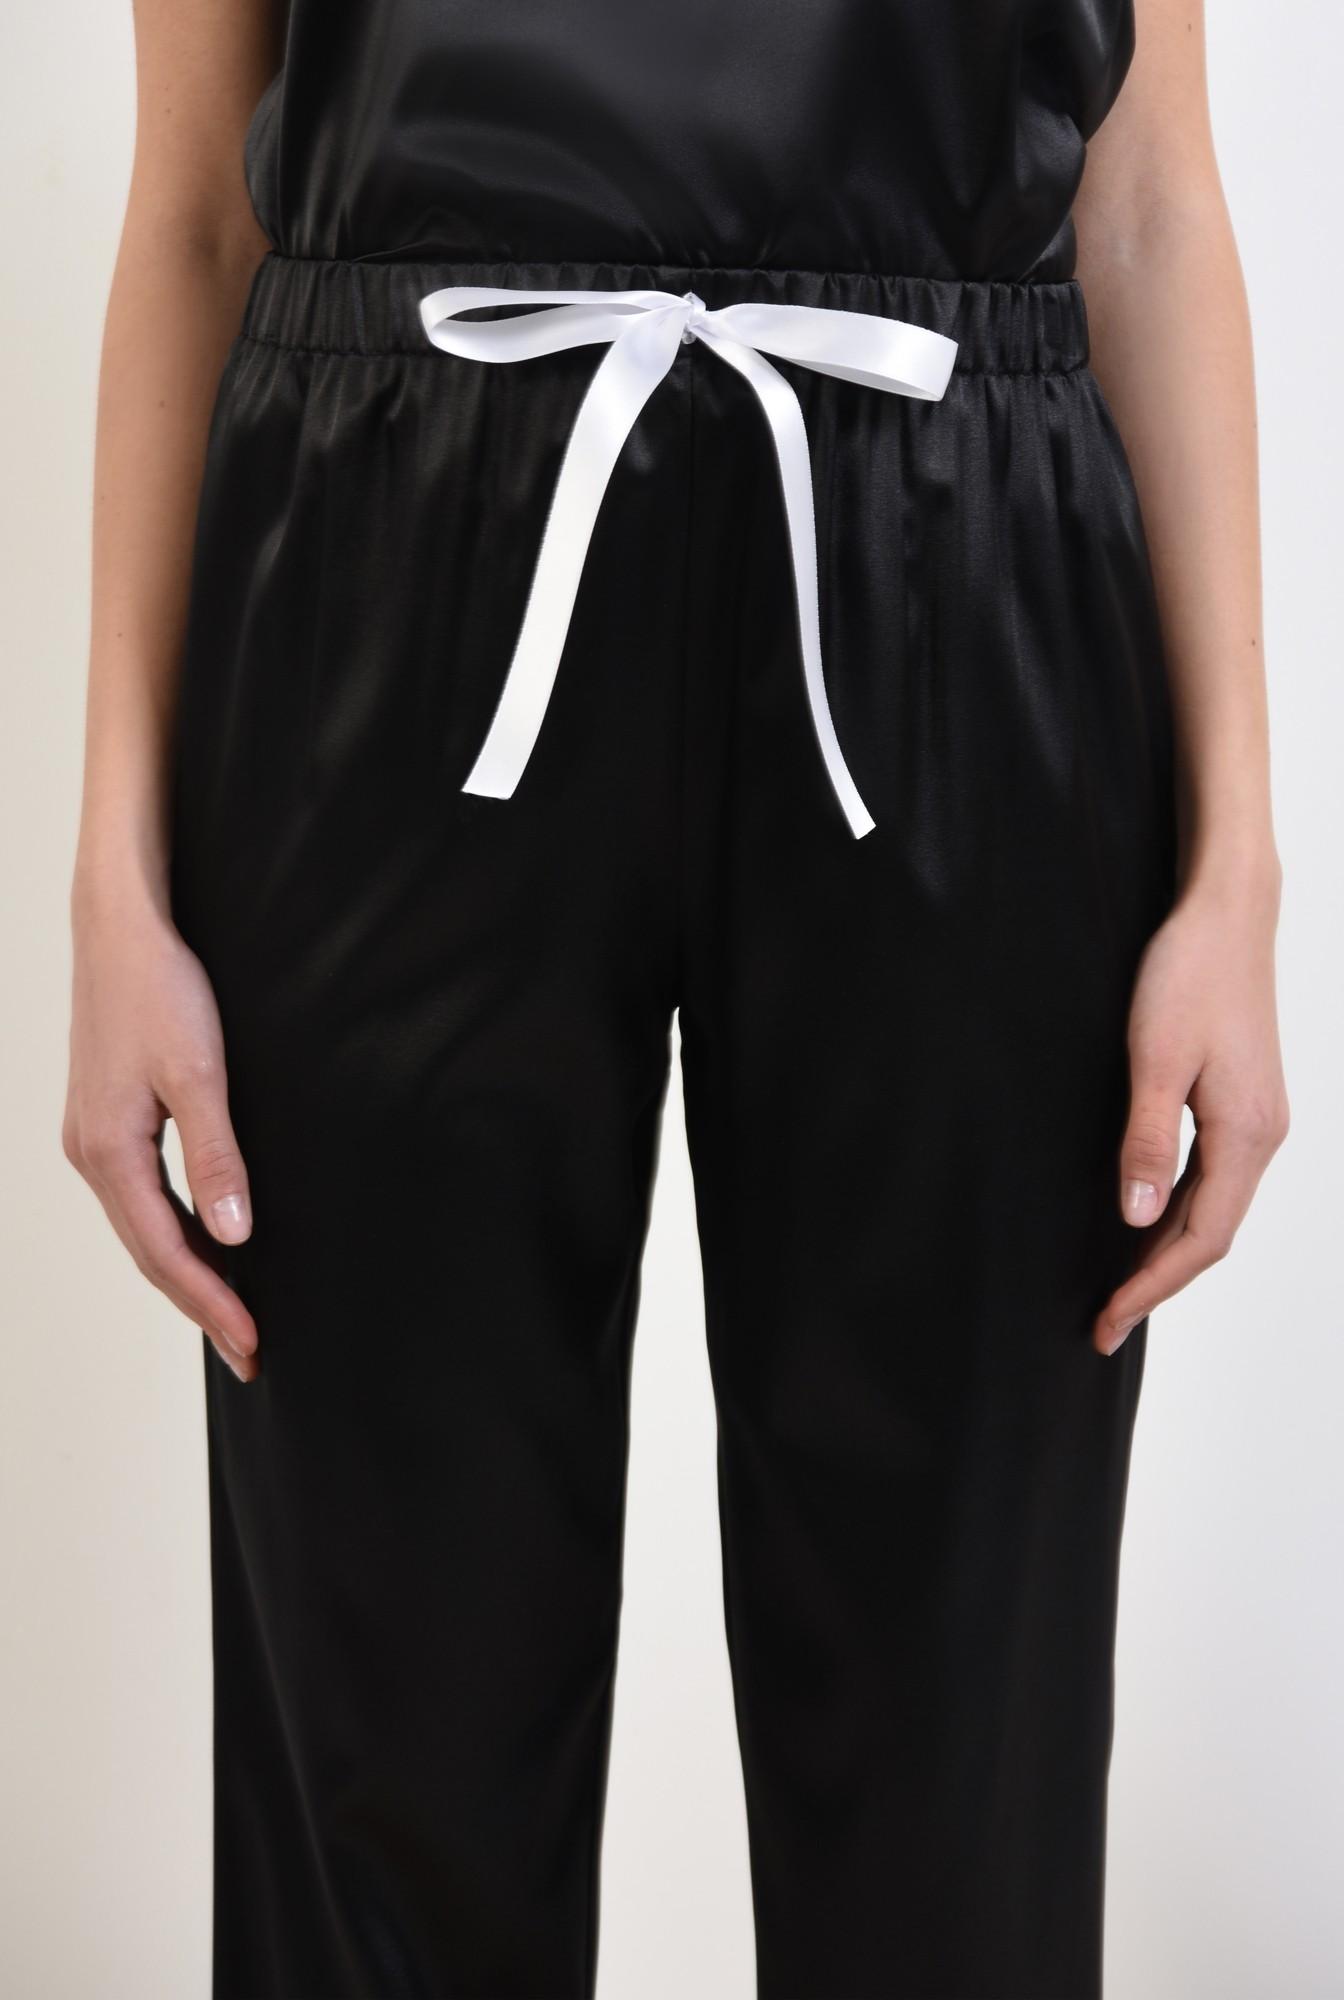 2 - 360 - pantaloni din satin, negri, lungi, cu funda in contrast